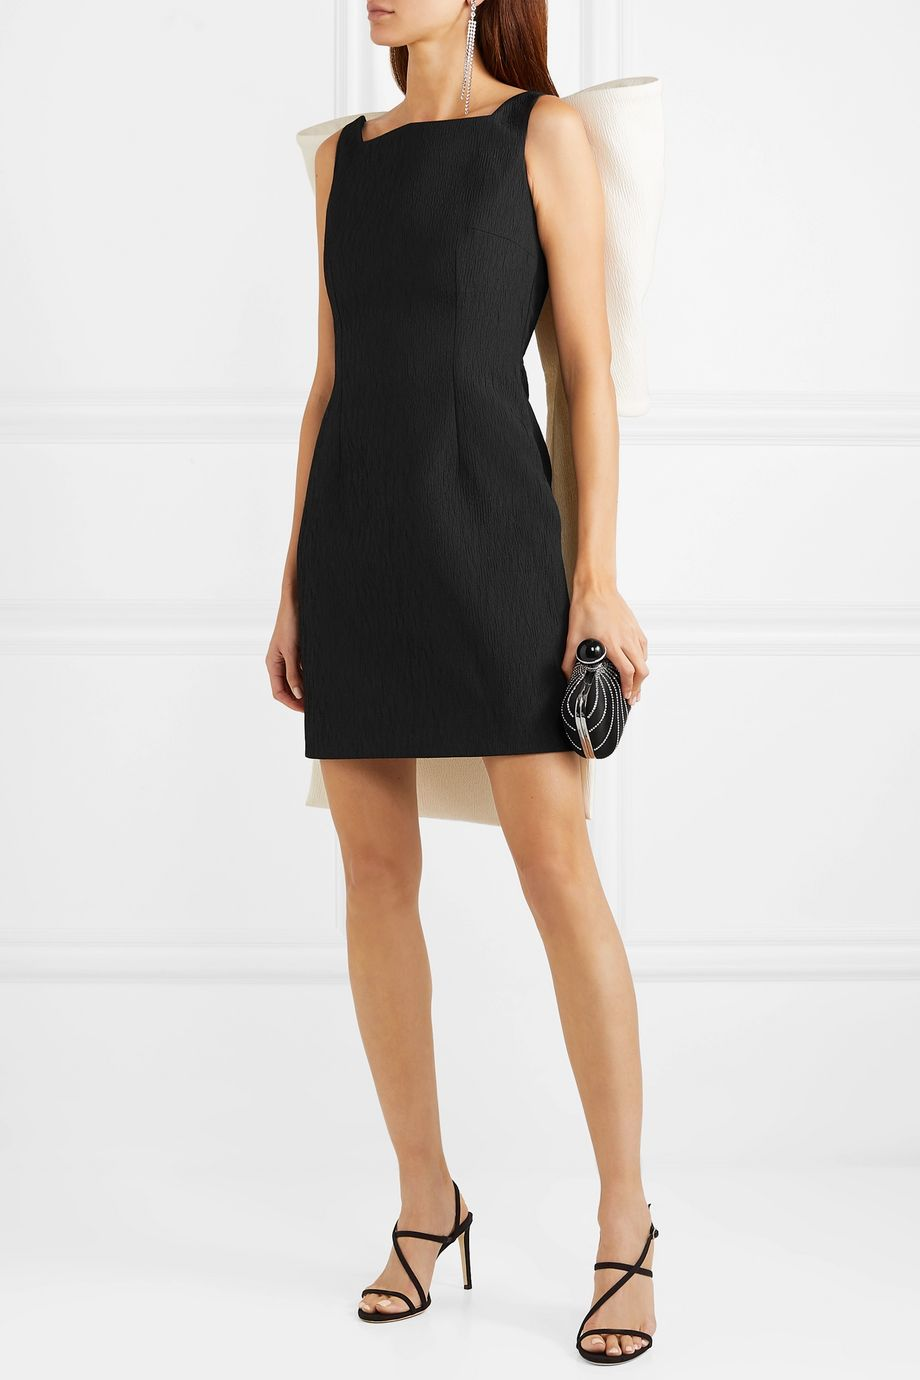 Emilia Wickstead Cruz bow-embellished cloqué mini dress